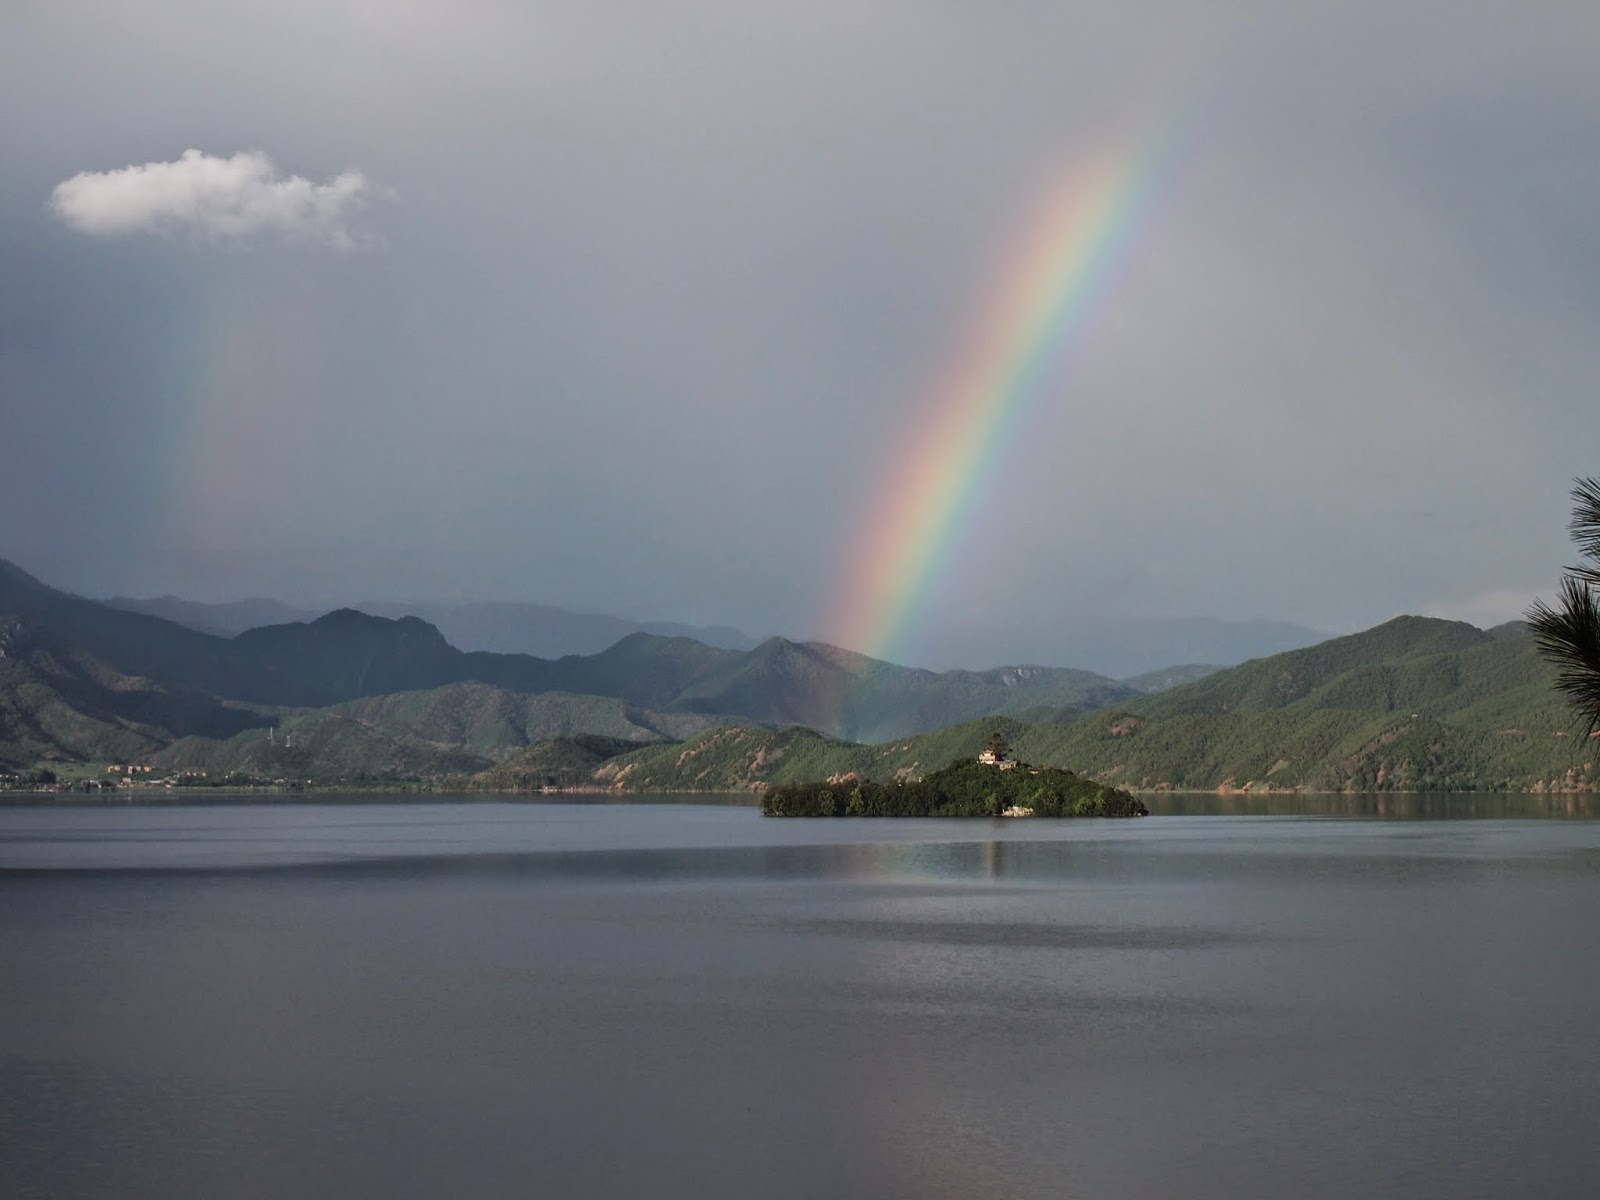 A double rainbow at Lugu Lake